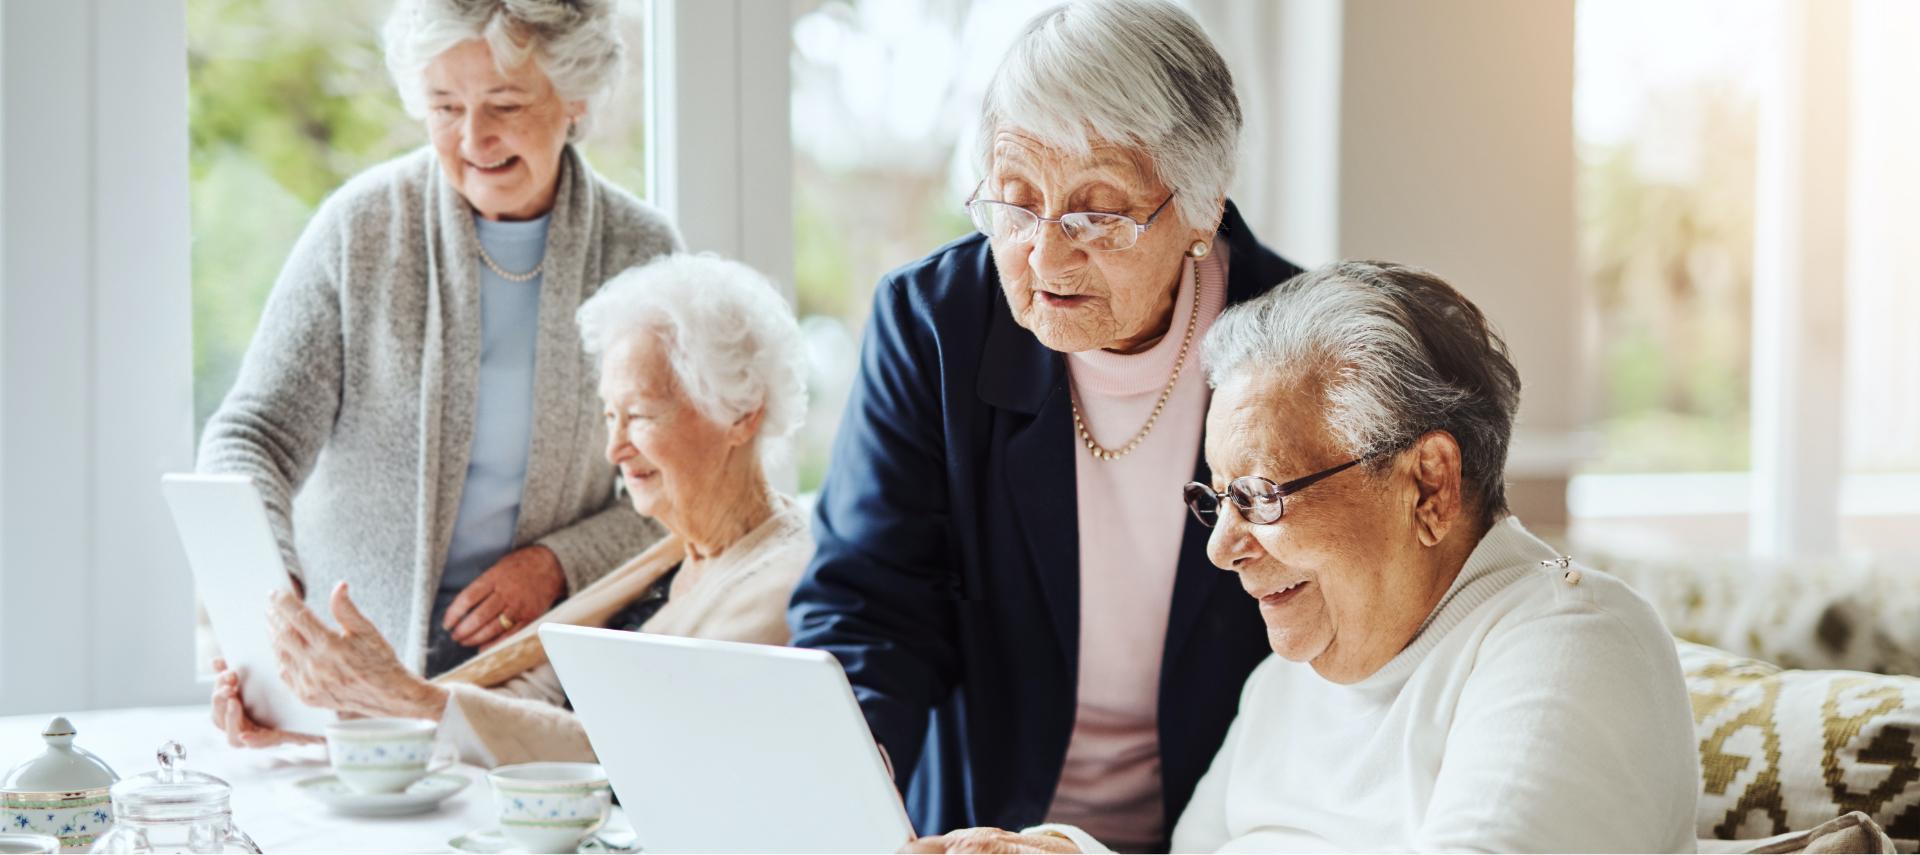 Seniorengruppe sehen sich etwas am Tablet an.